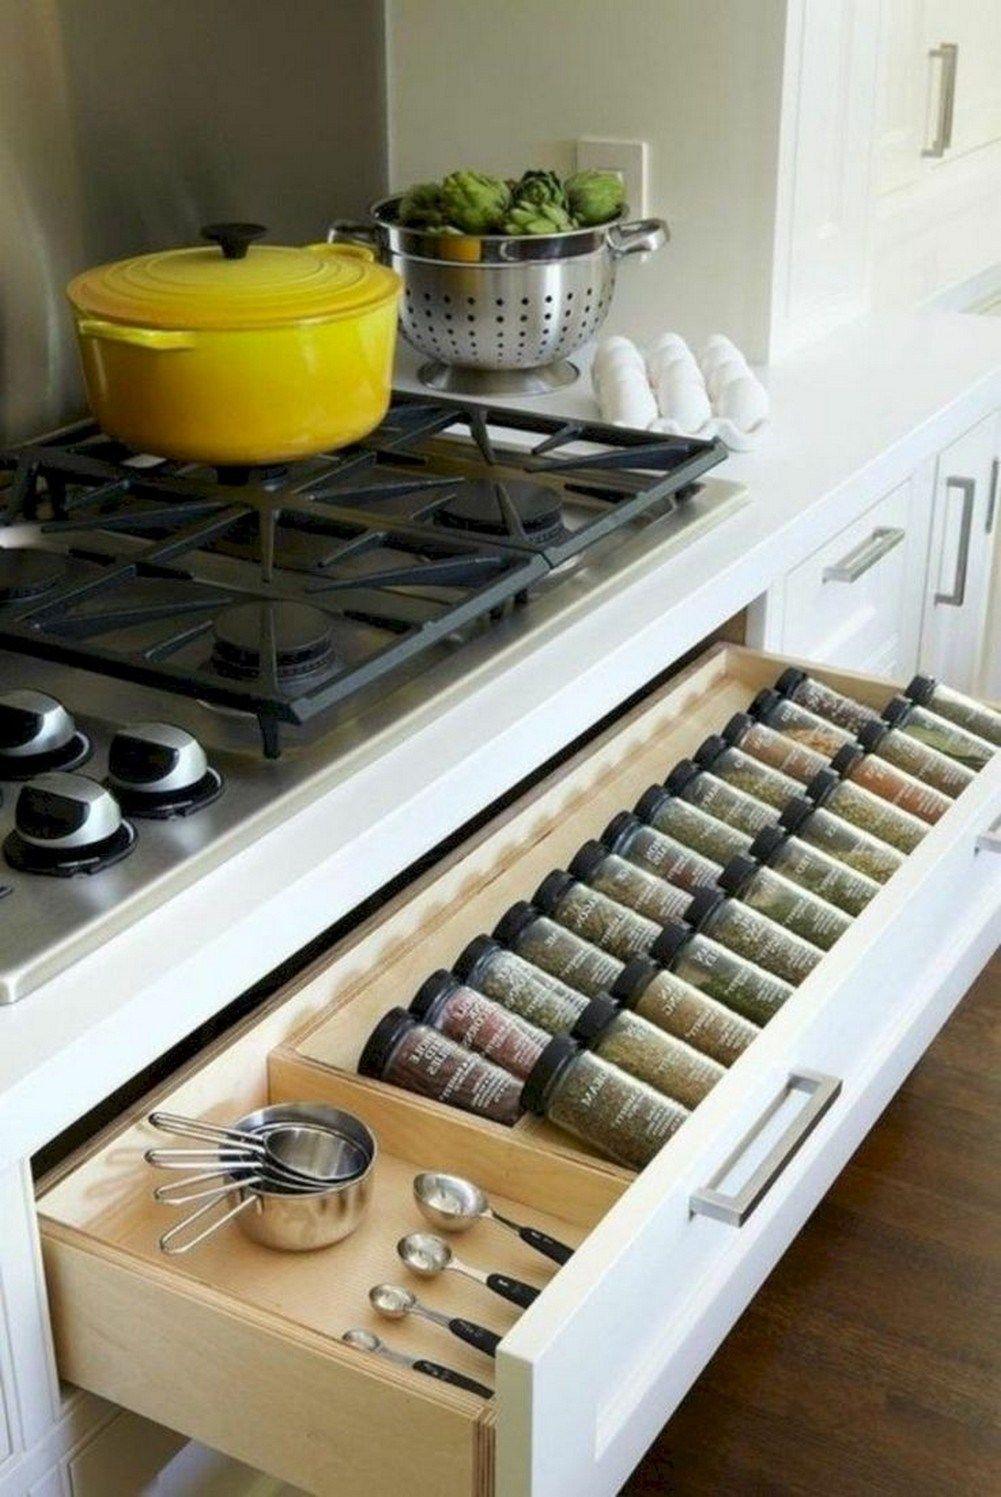 25 brilliant kitchen cabinet organization and tips ideas 7 on brilliant kitchen cabinet organization id=49147